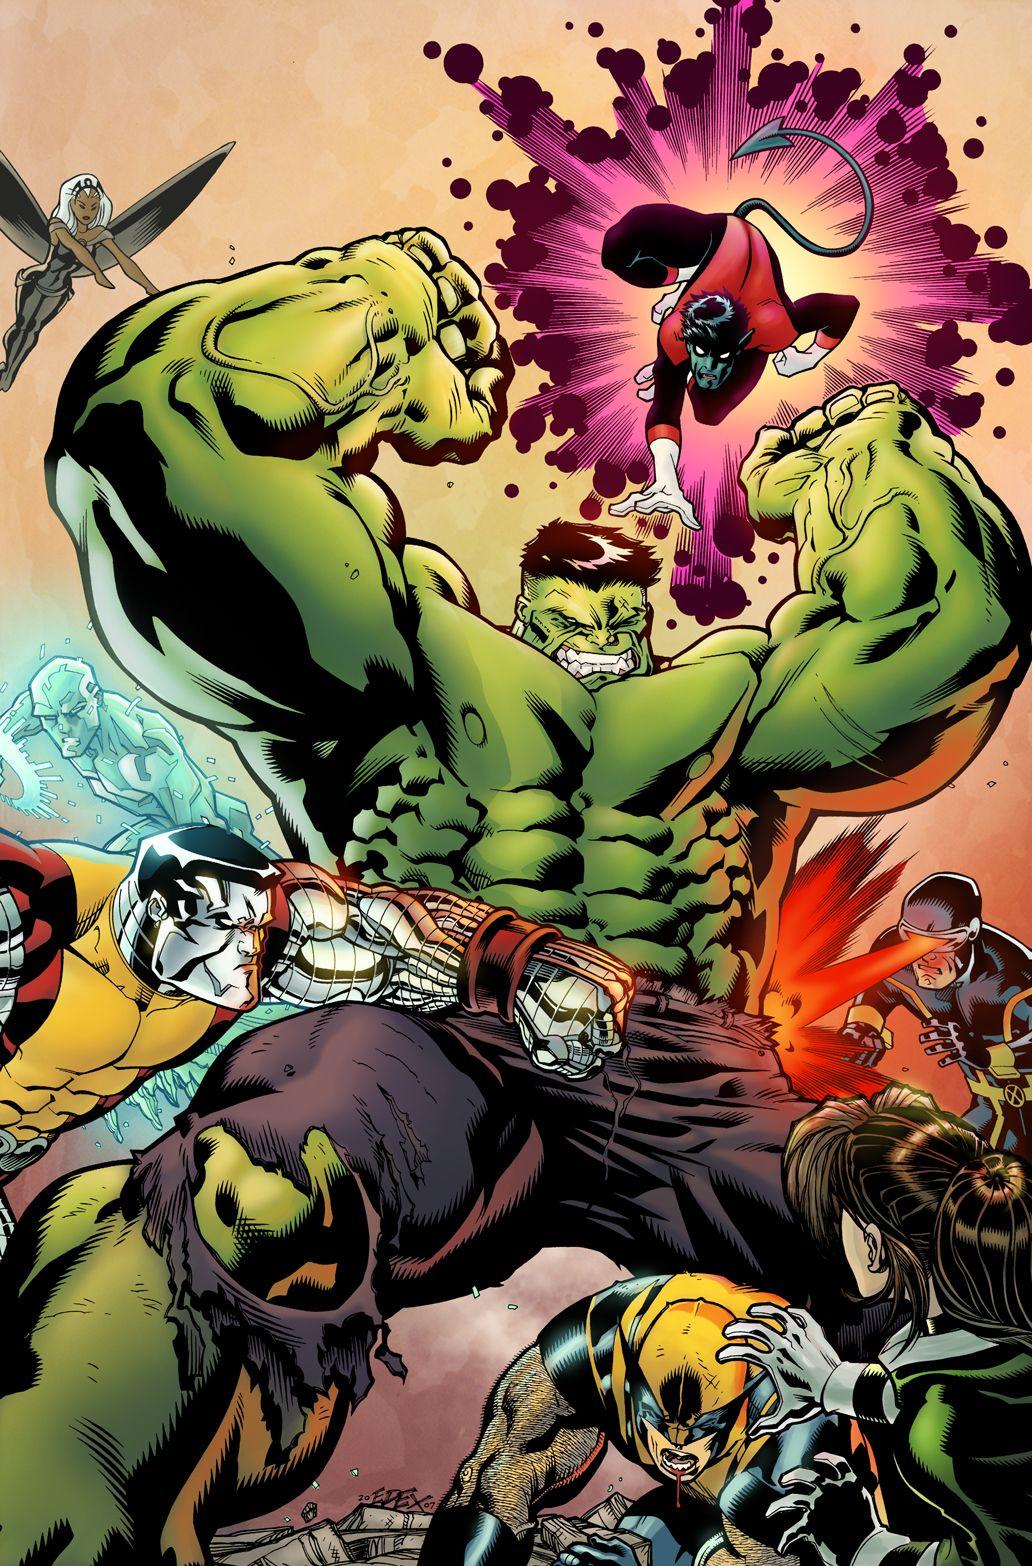 Hulk Vs Xmen Hulk Artwork Hulk Art Marvel Art